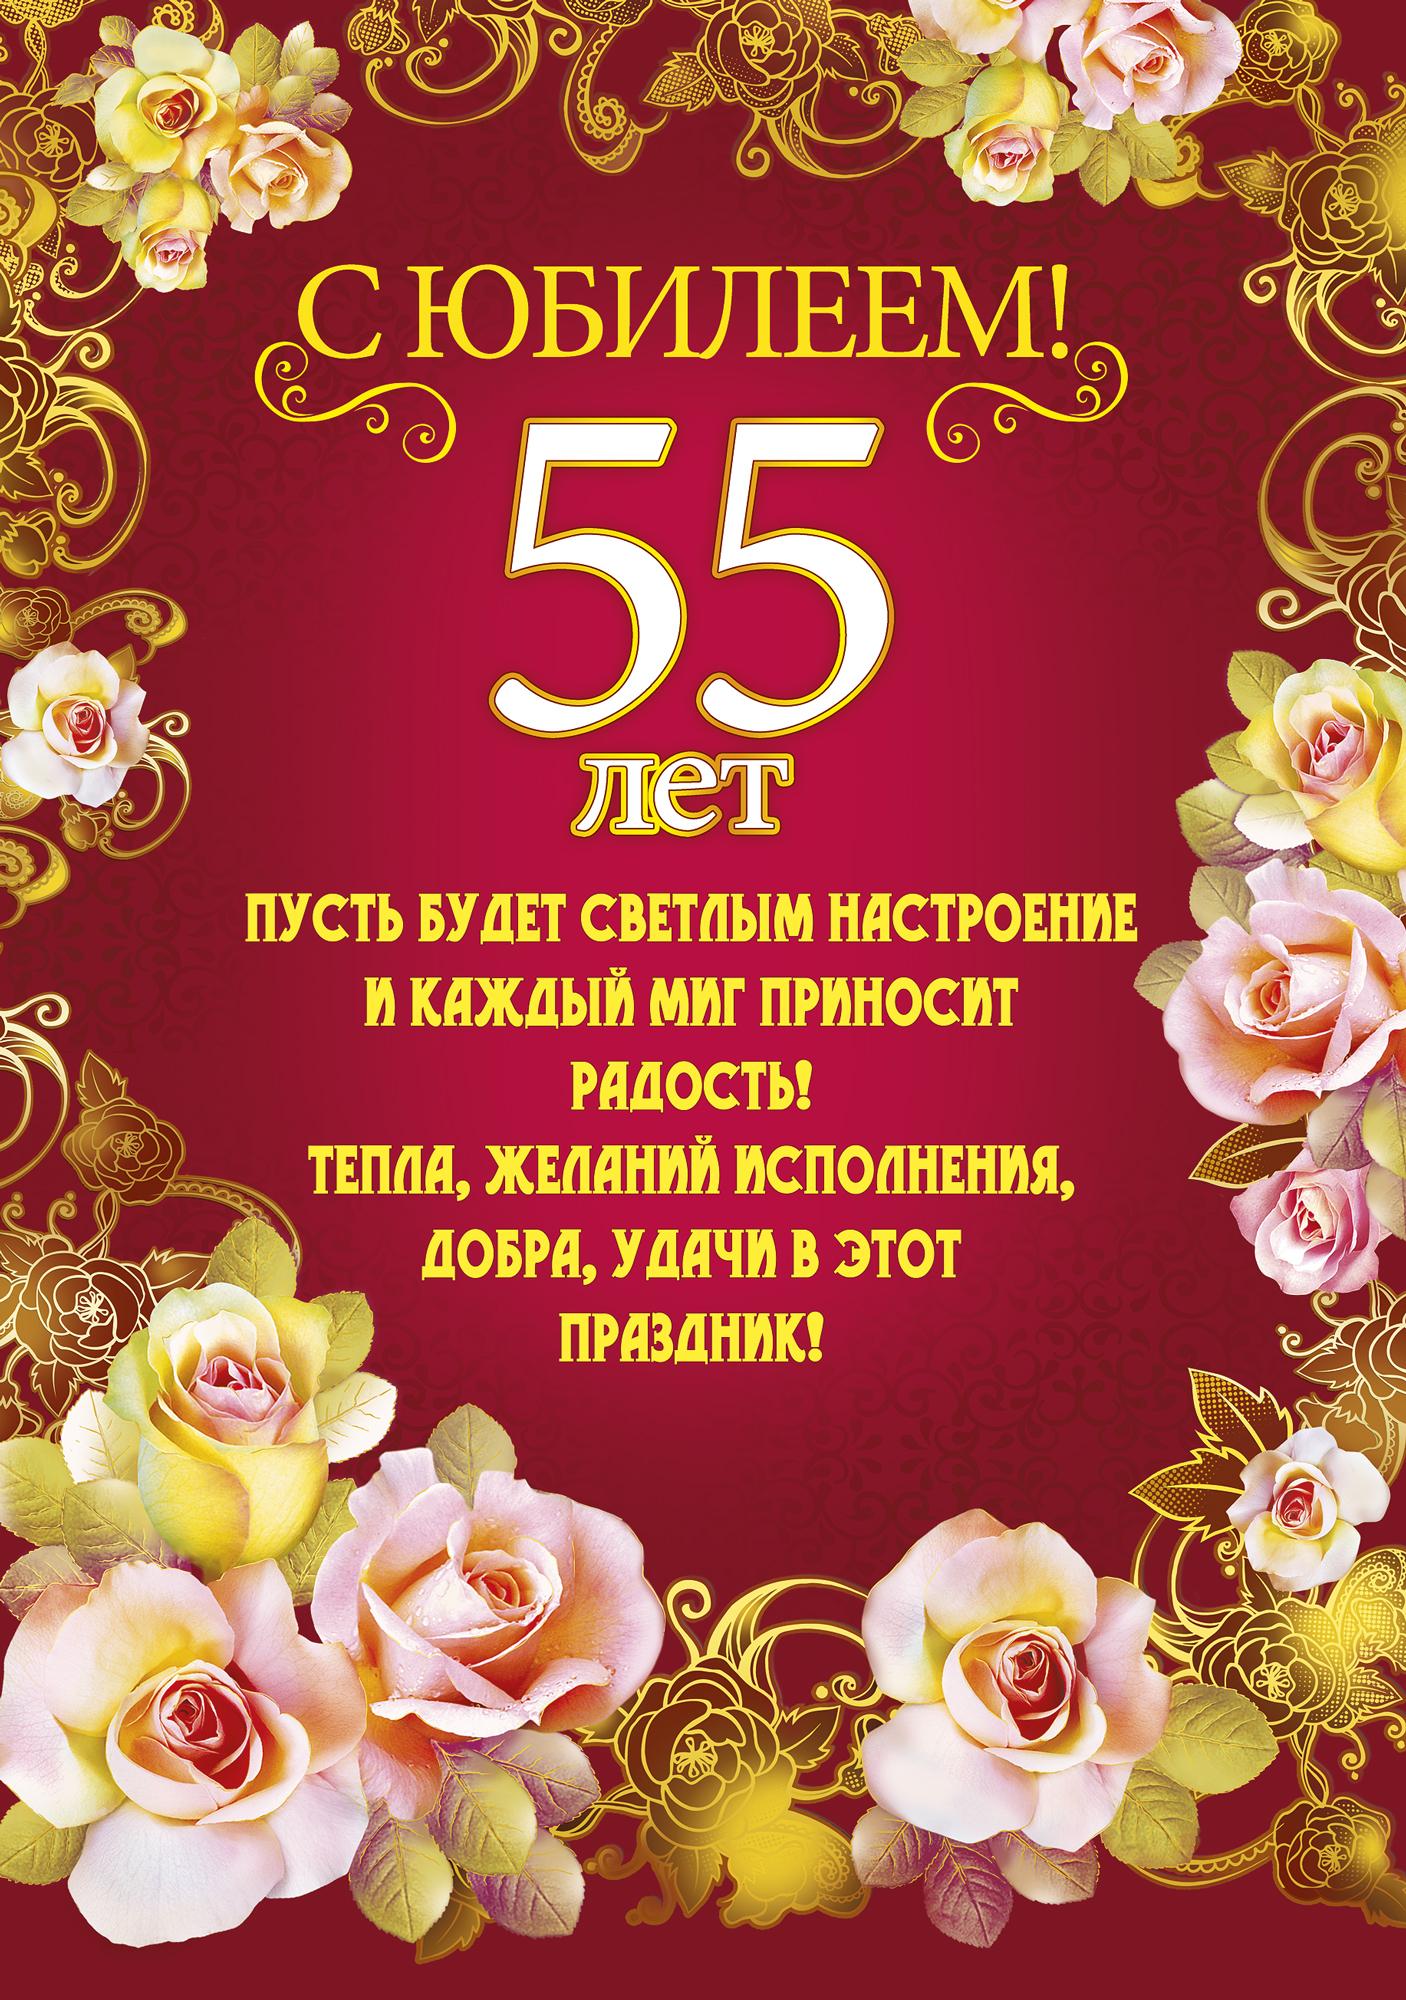 Пожелание на 55 лет мужчине